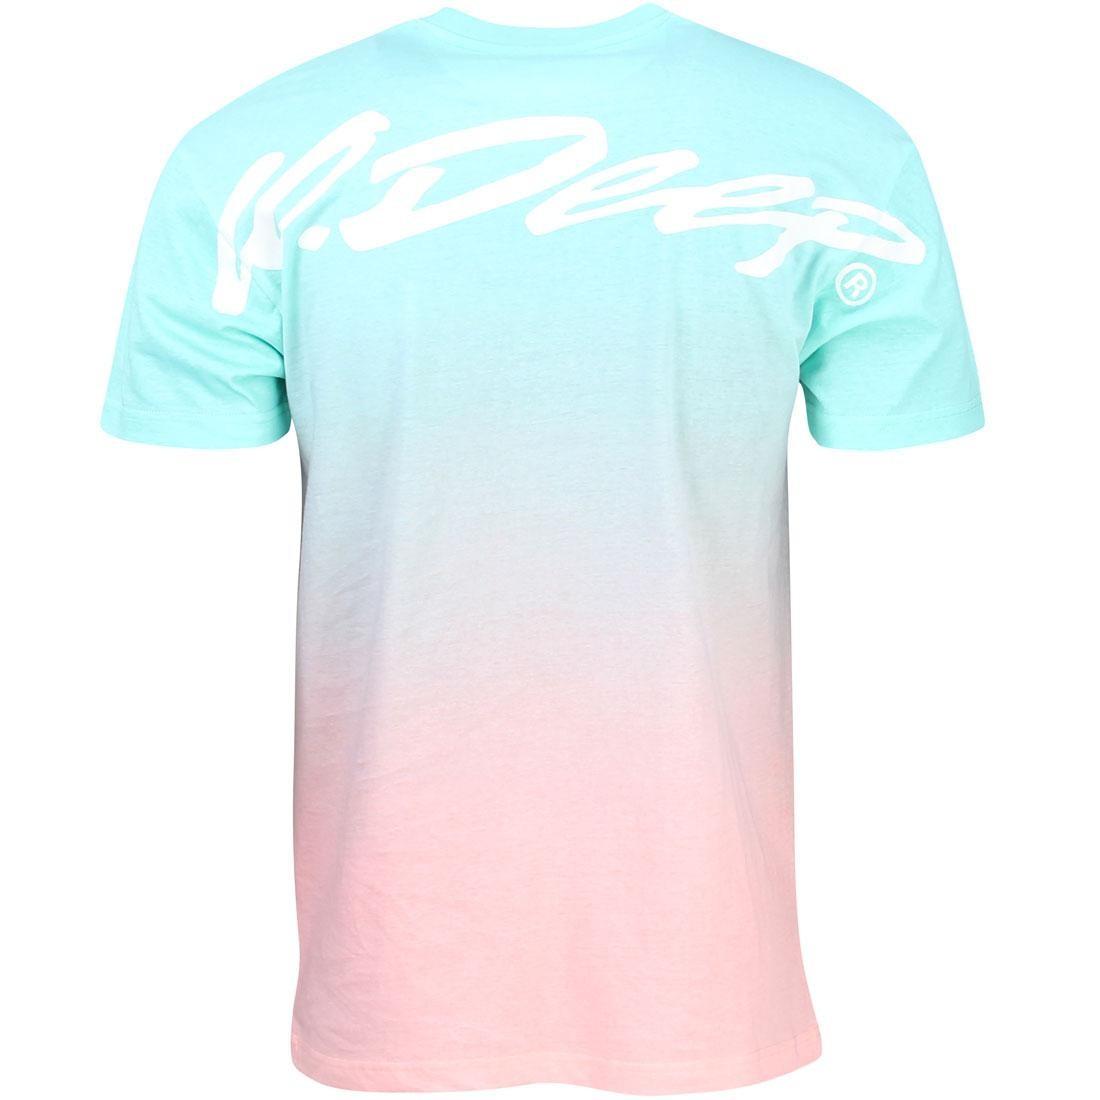 【NeaYearSALE1/1-1/5】ディープ Tシャツ 【 10 DEEP MEN S15 FADE AWAY TEE TEAL 】 メンズファッション トップス カットソー 送料無料